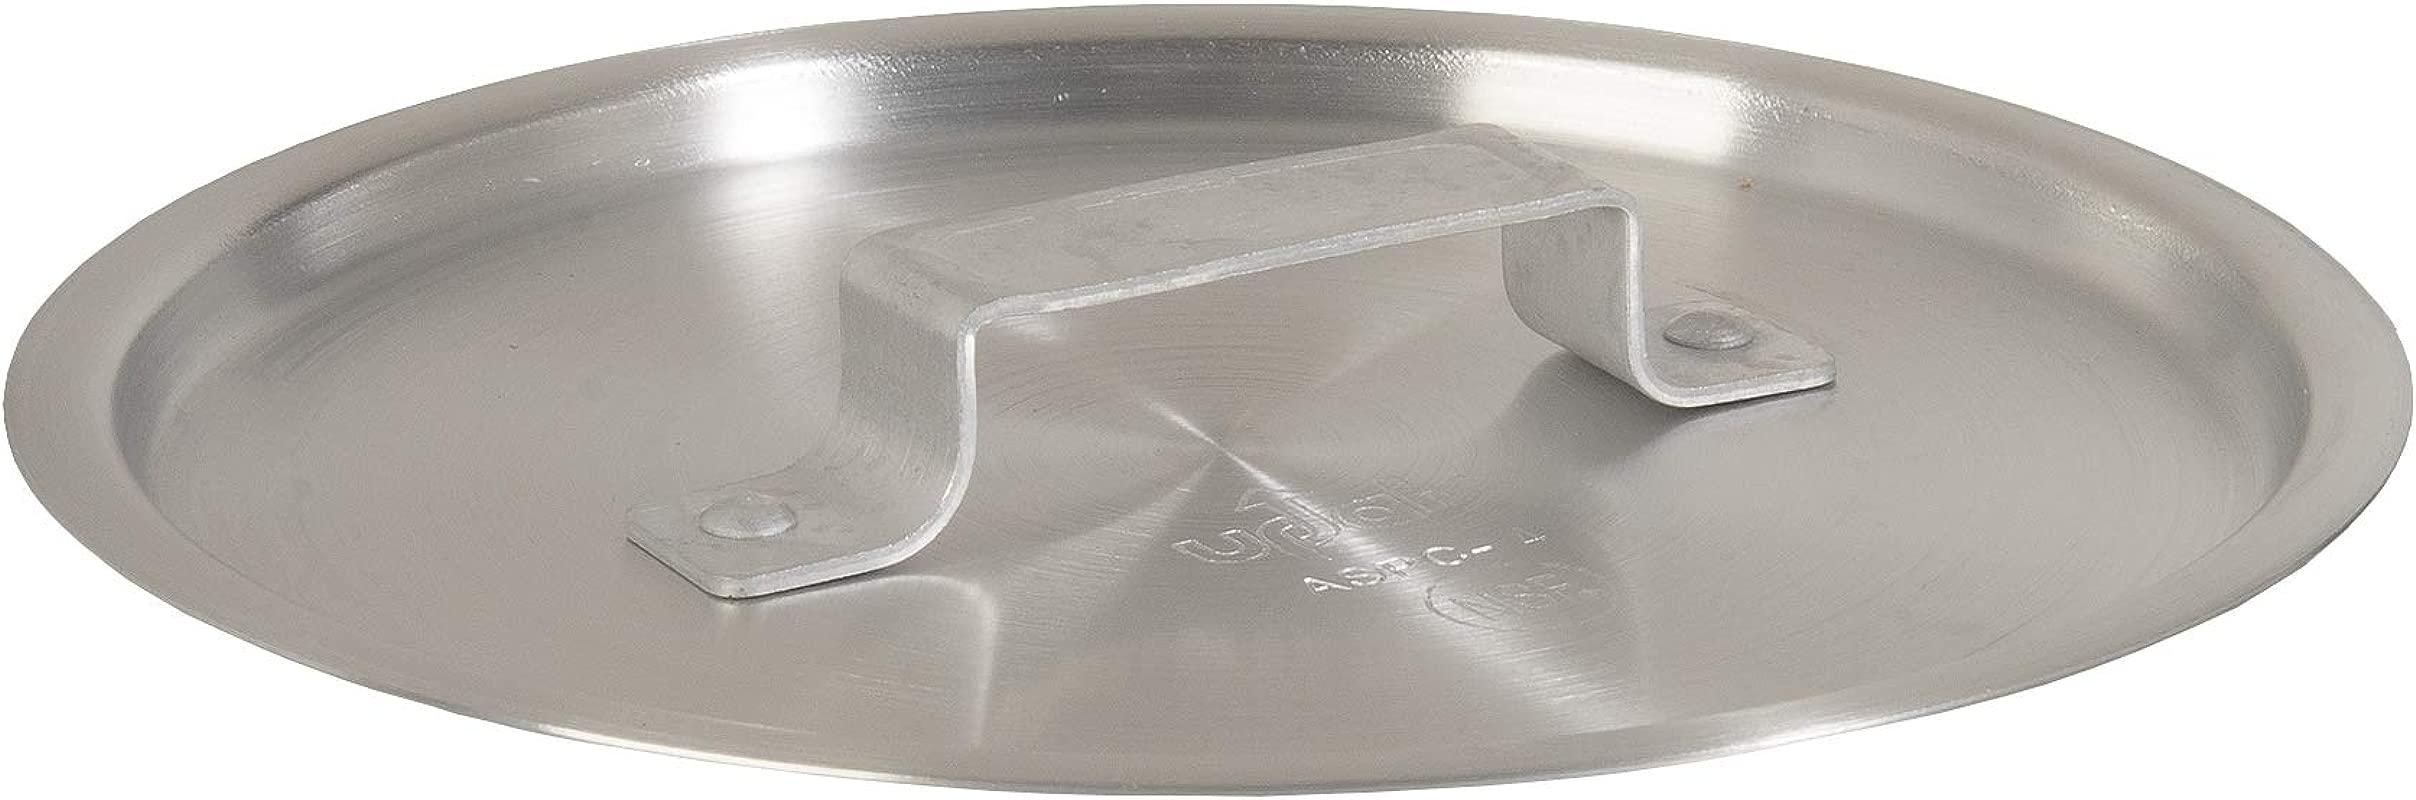 Update International ASPC 10 12 1 2 Aluminum Sauce Pan Cover